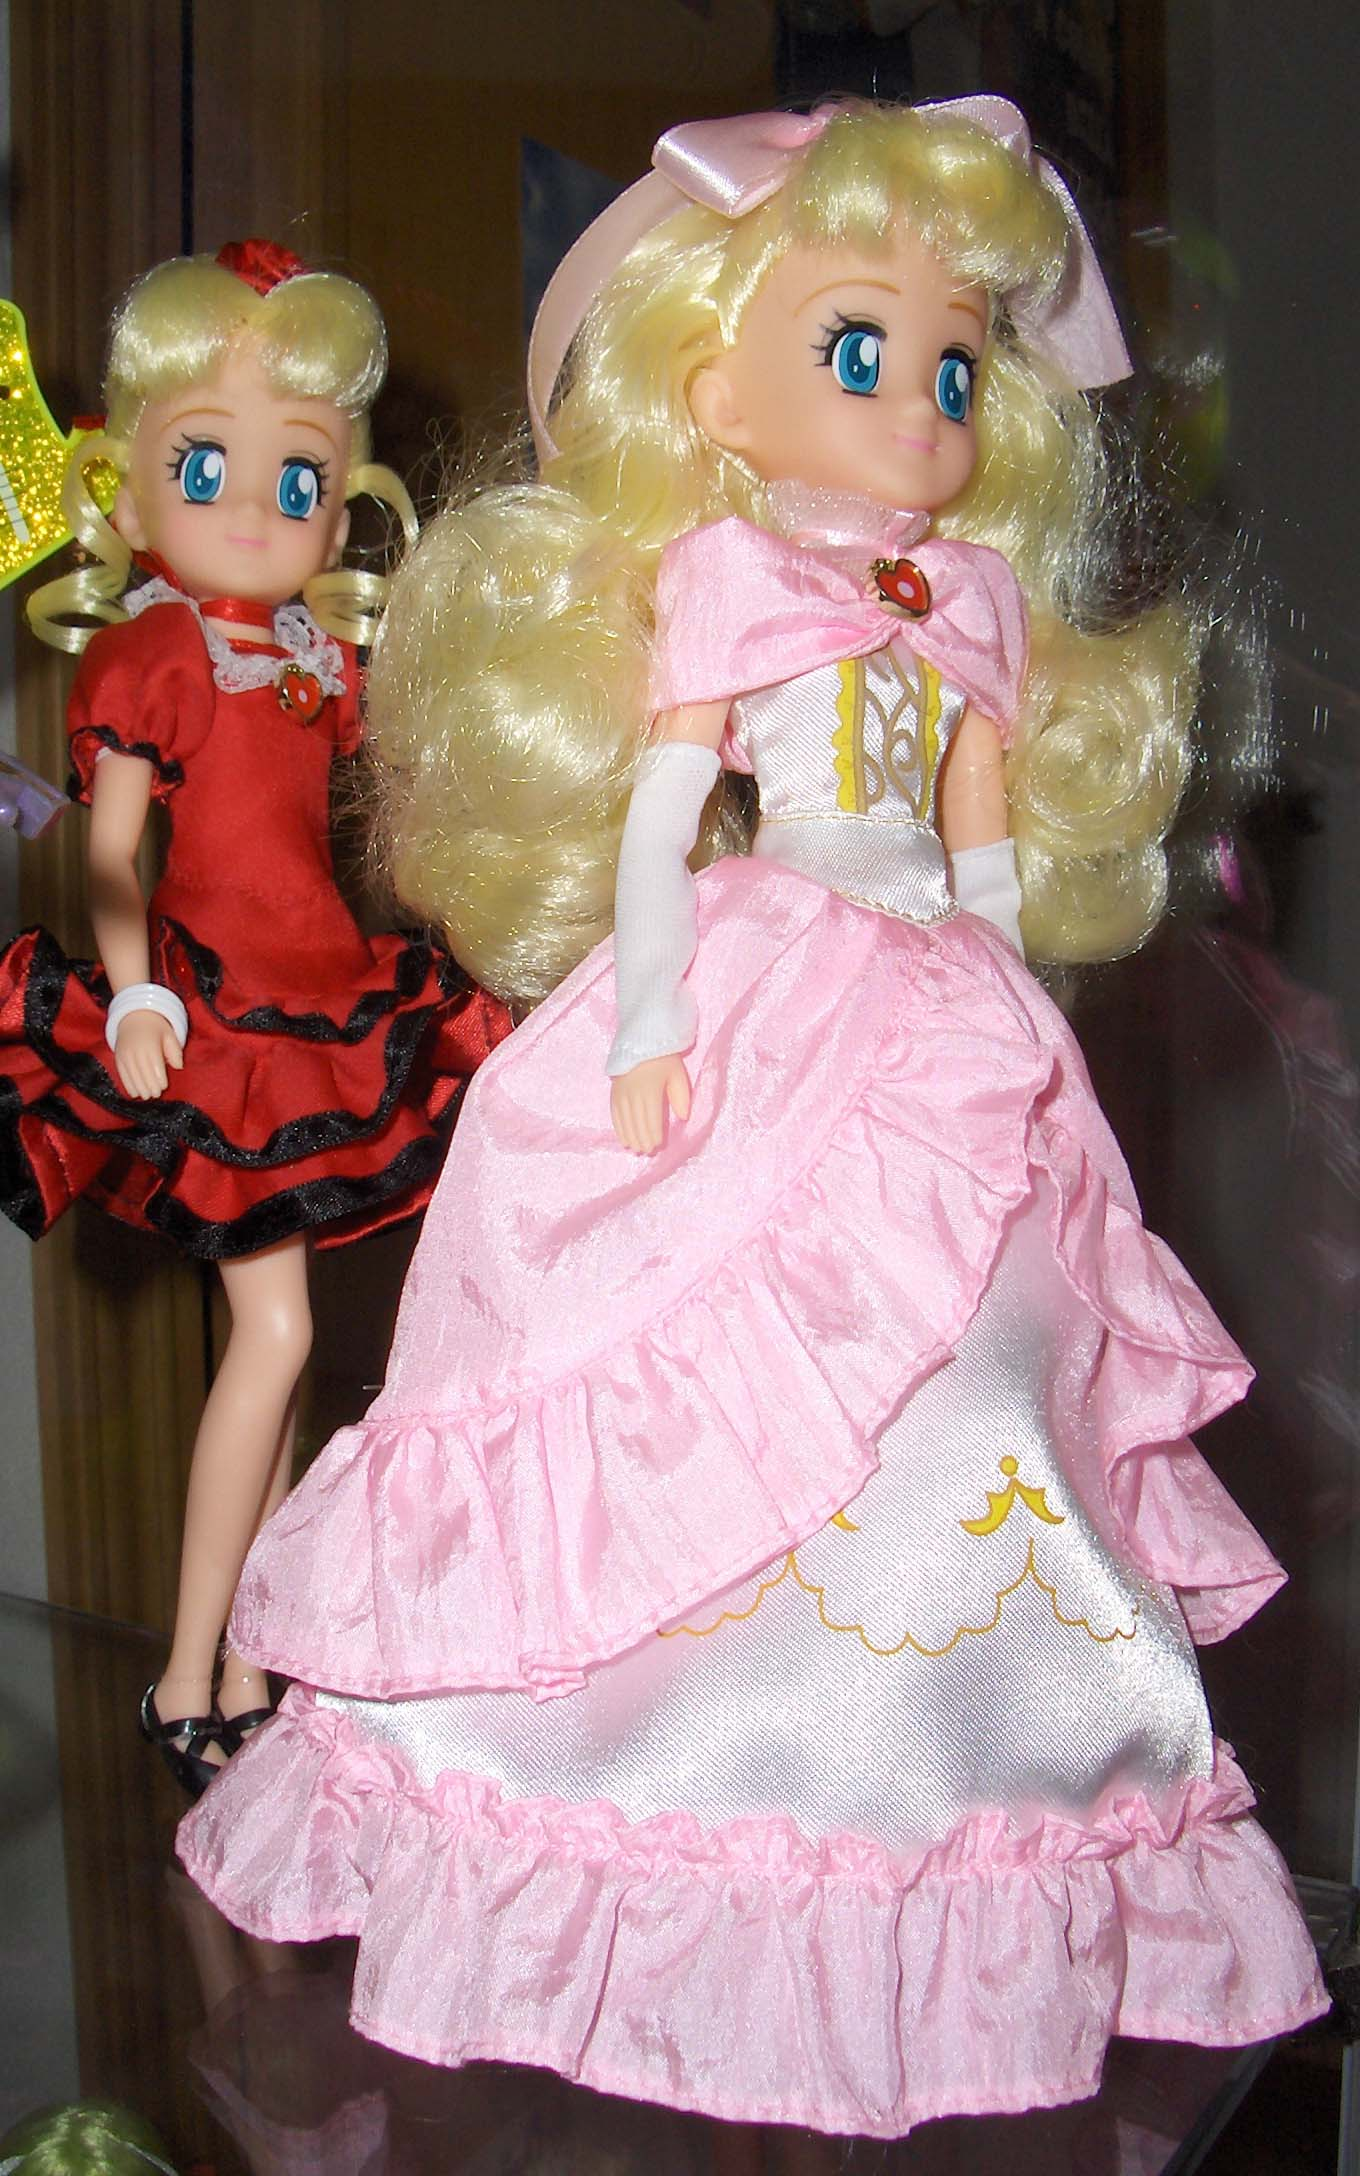 Mycollection1 for Bambole barbie